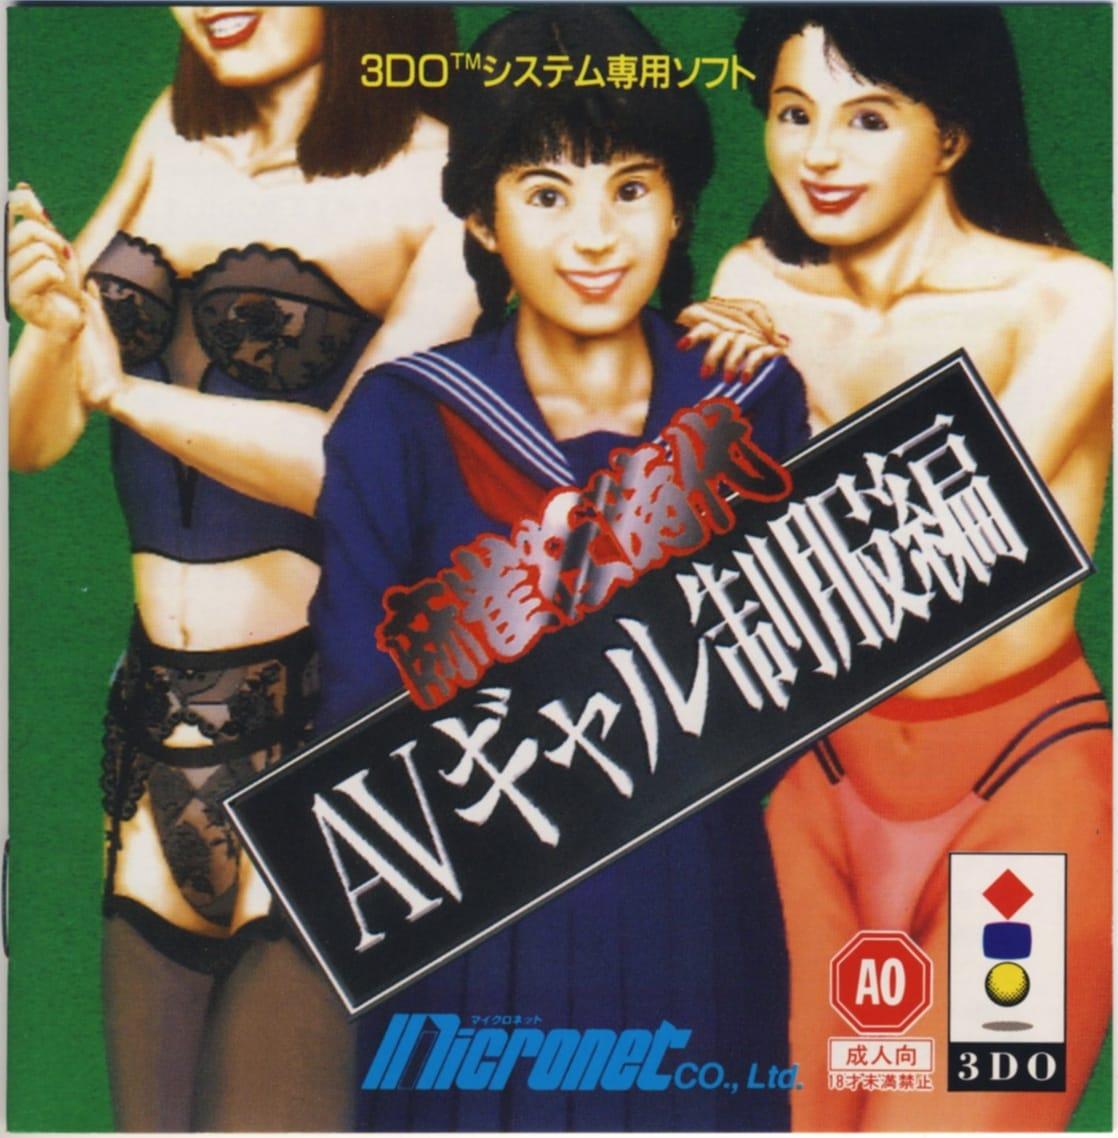 picture of mahjongkyou jidai - av gal seifuku hen (japan)